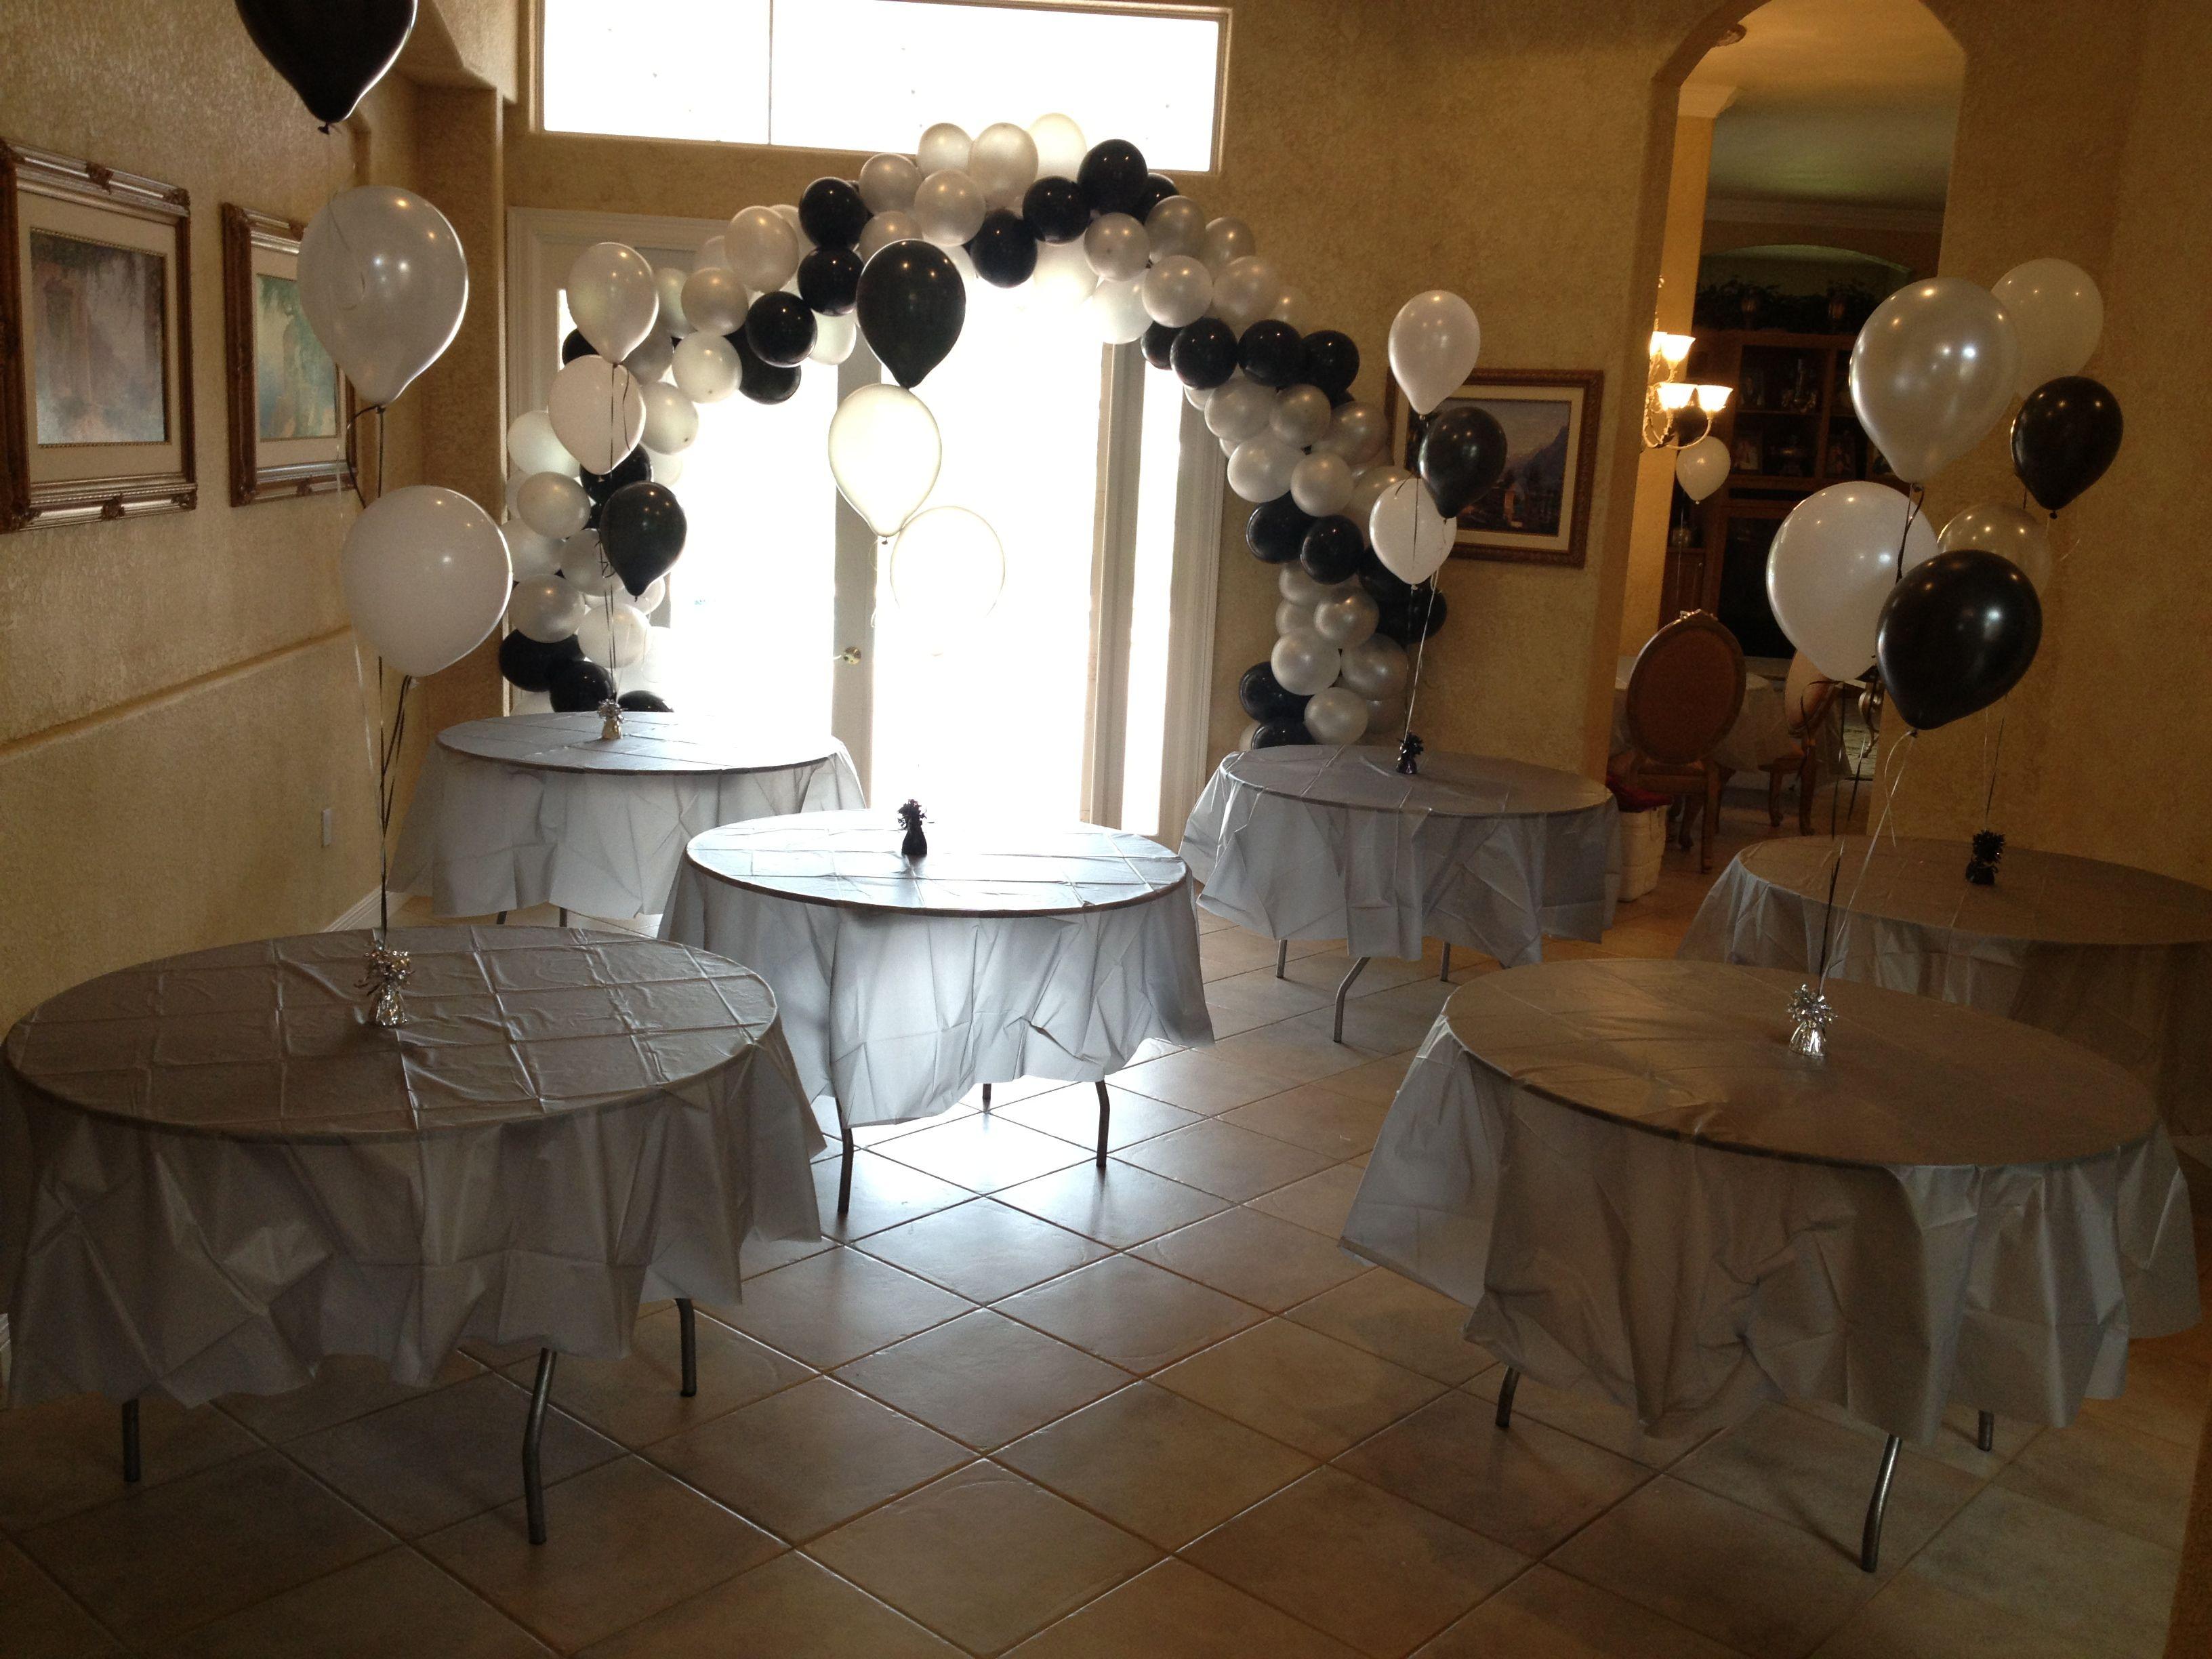 25 Wedding Anniversary Celebration Ideas: My Parents Surprise 25th Wedding Anniversary Party Set Up